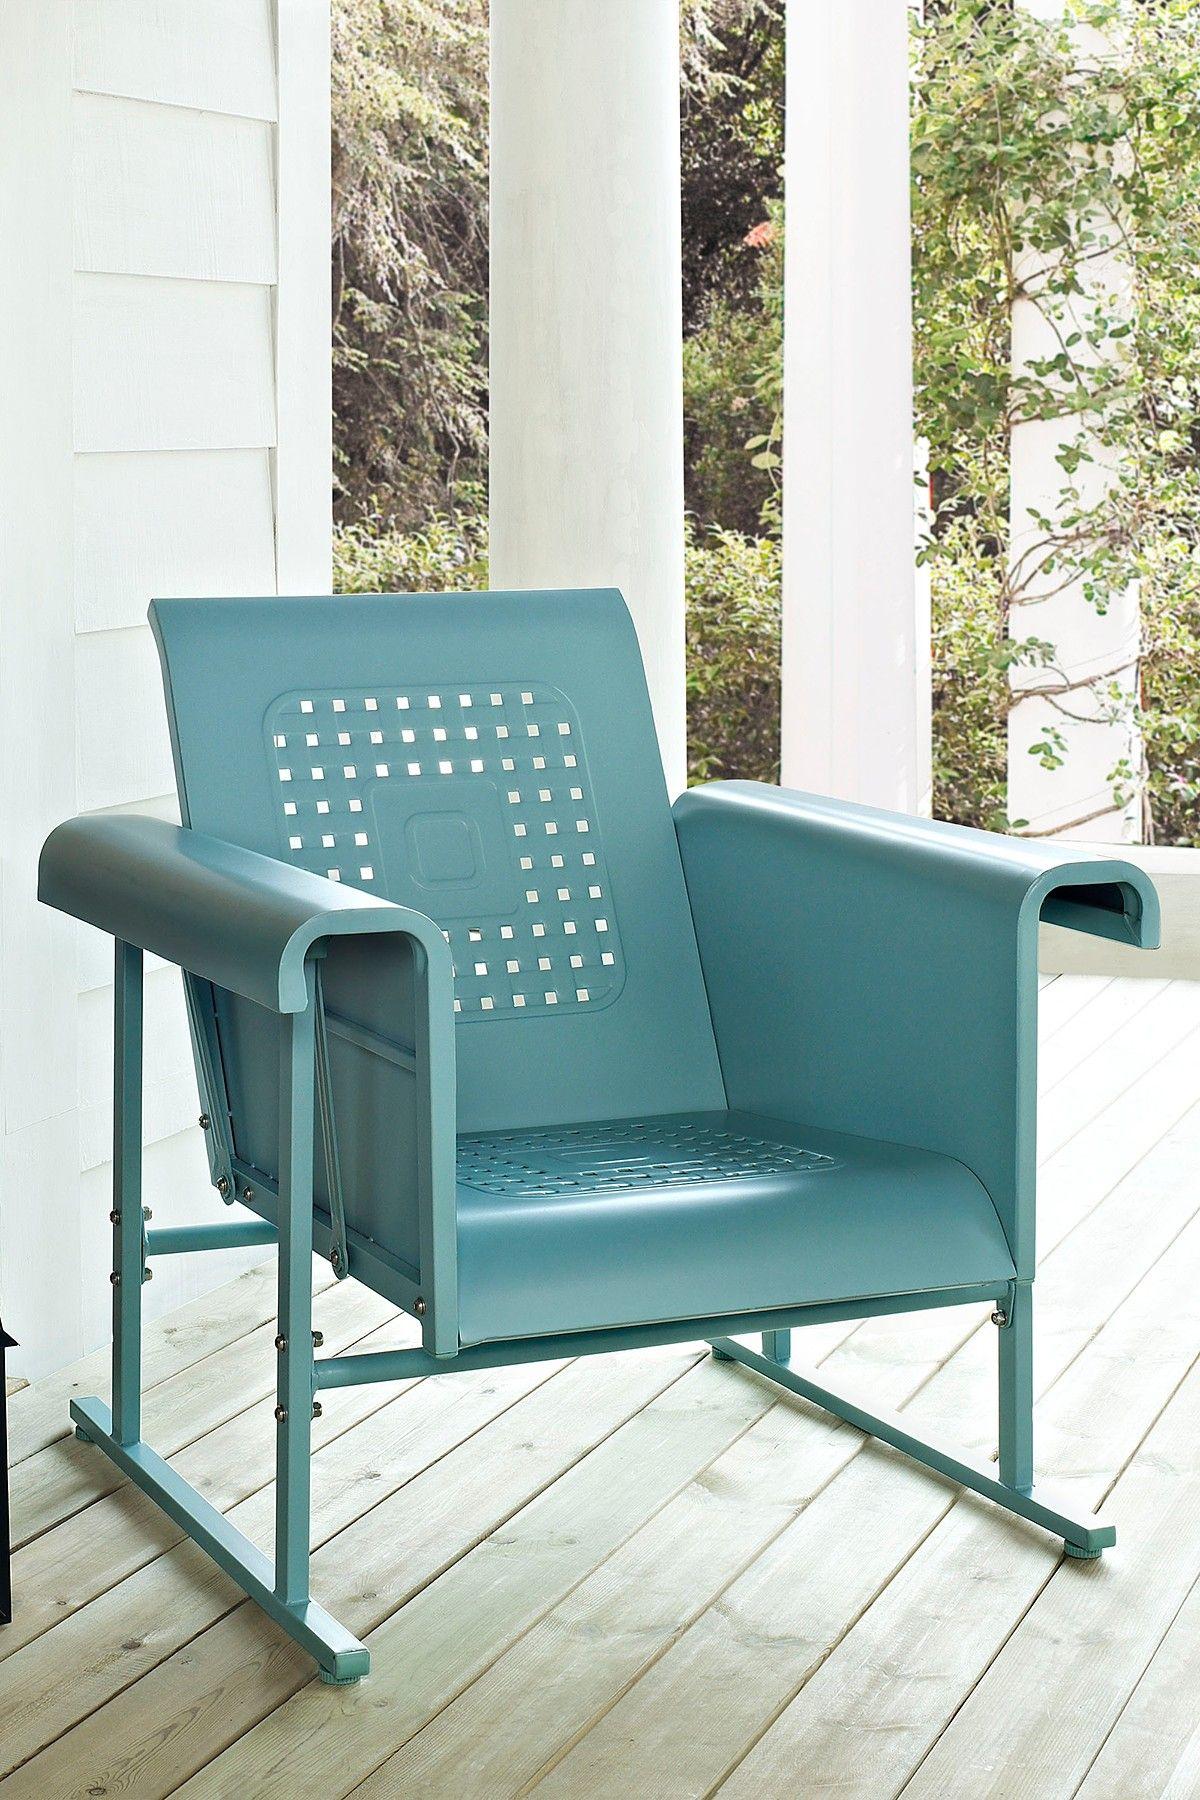 Crosley Outdoor Furniture Caribbean Blue Veranda Single Glider Chair Glider Chair Patio Rocking Chairs Outdoor Chairs